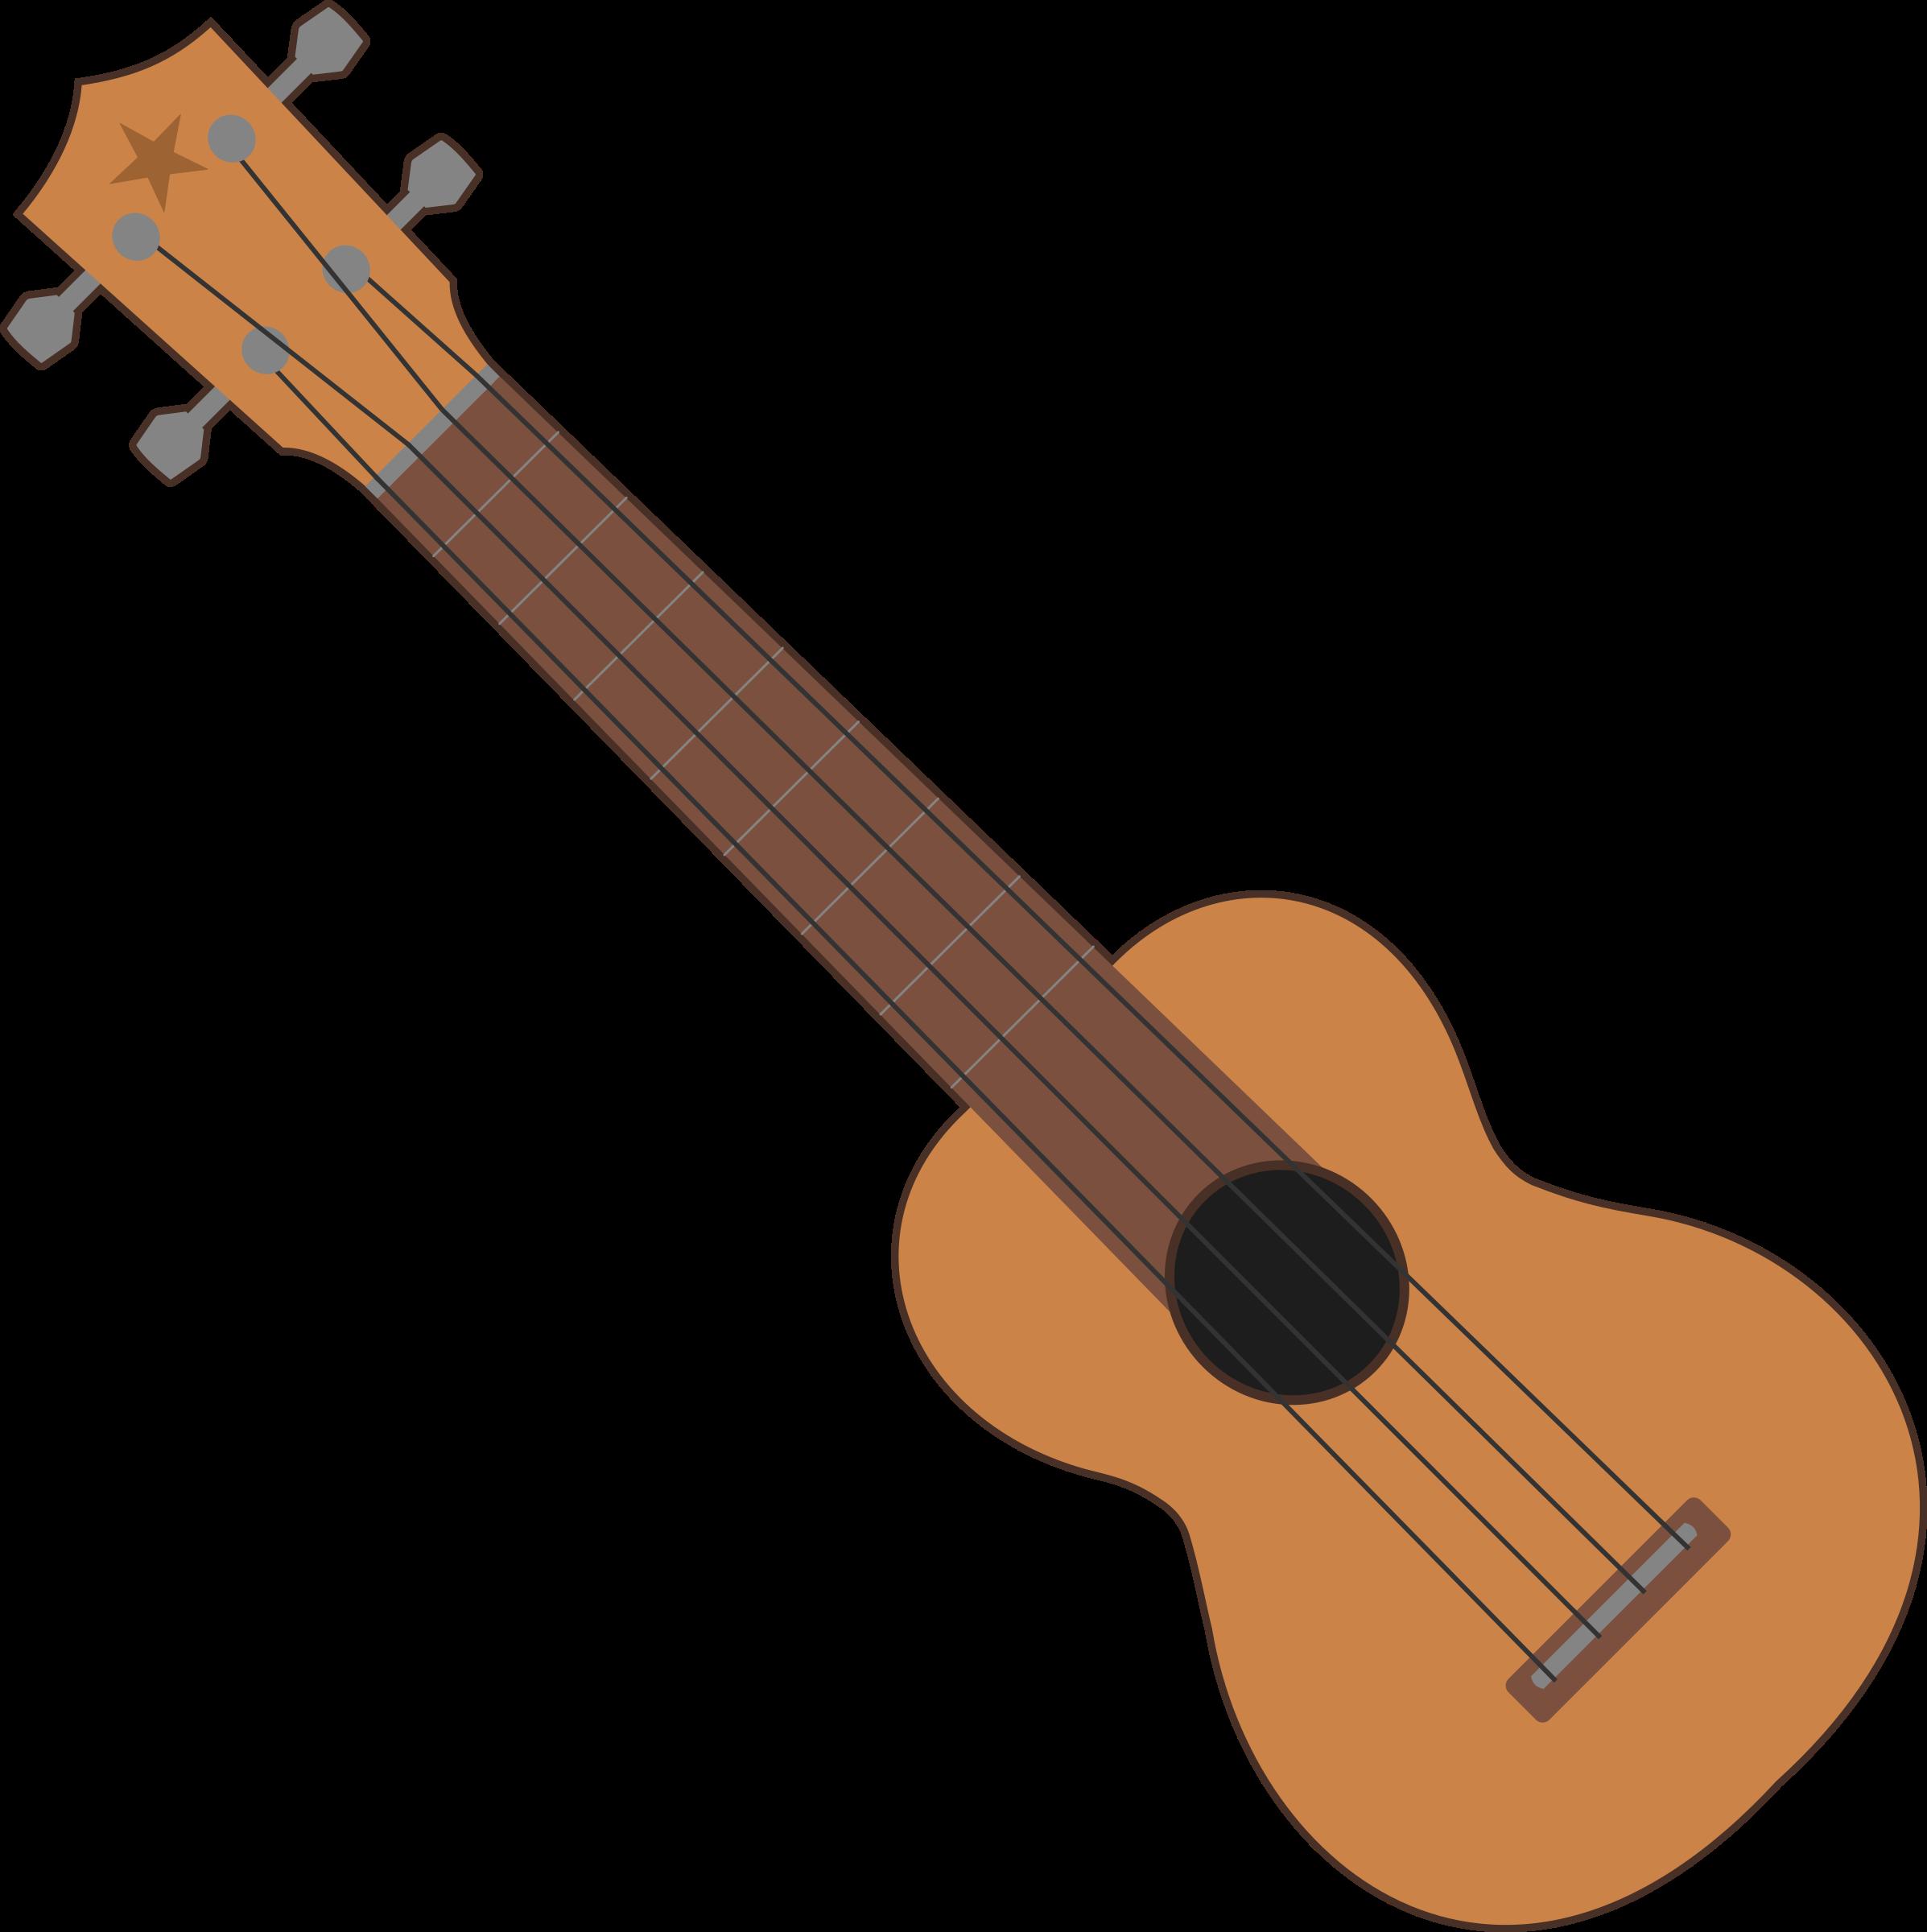 jpg royalty free Ukulele Clipart hawaiian guitar